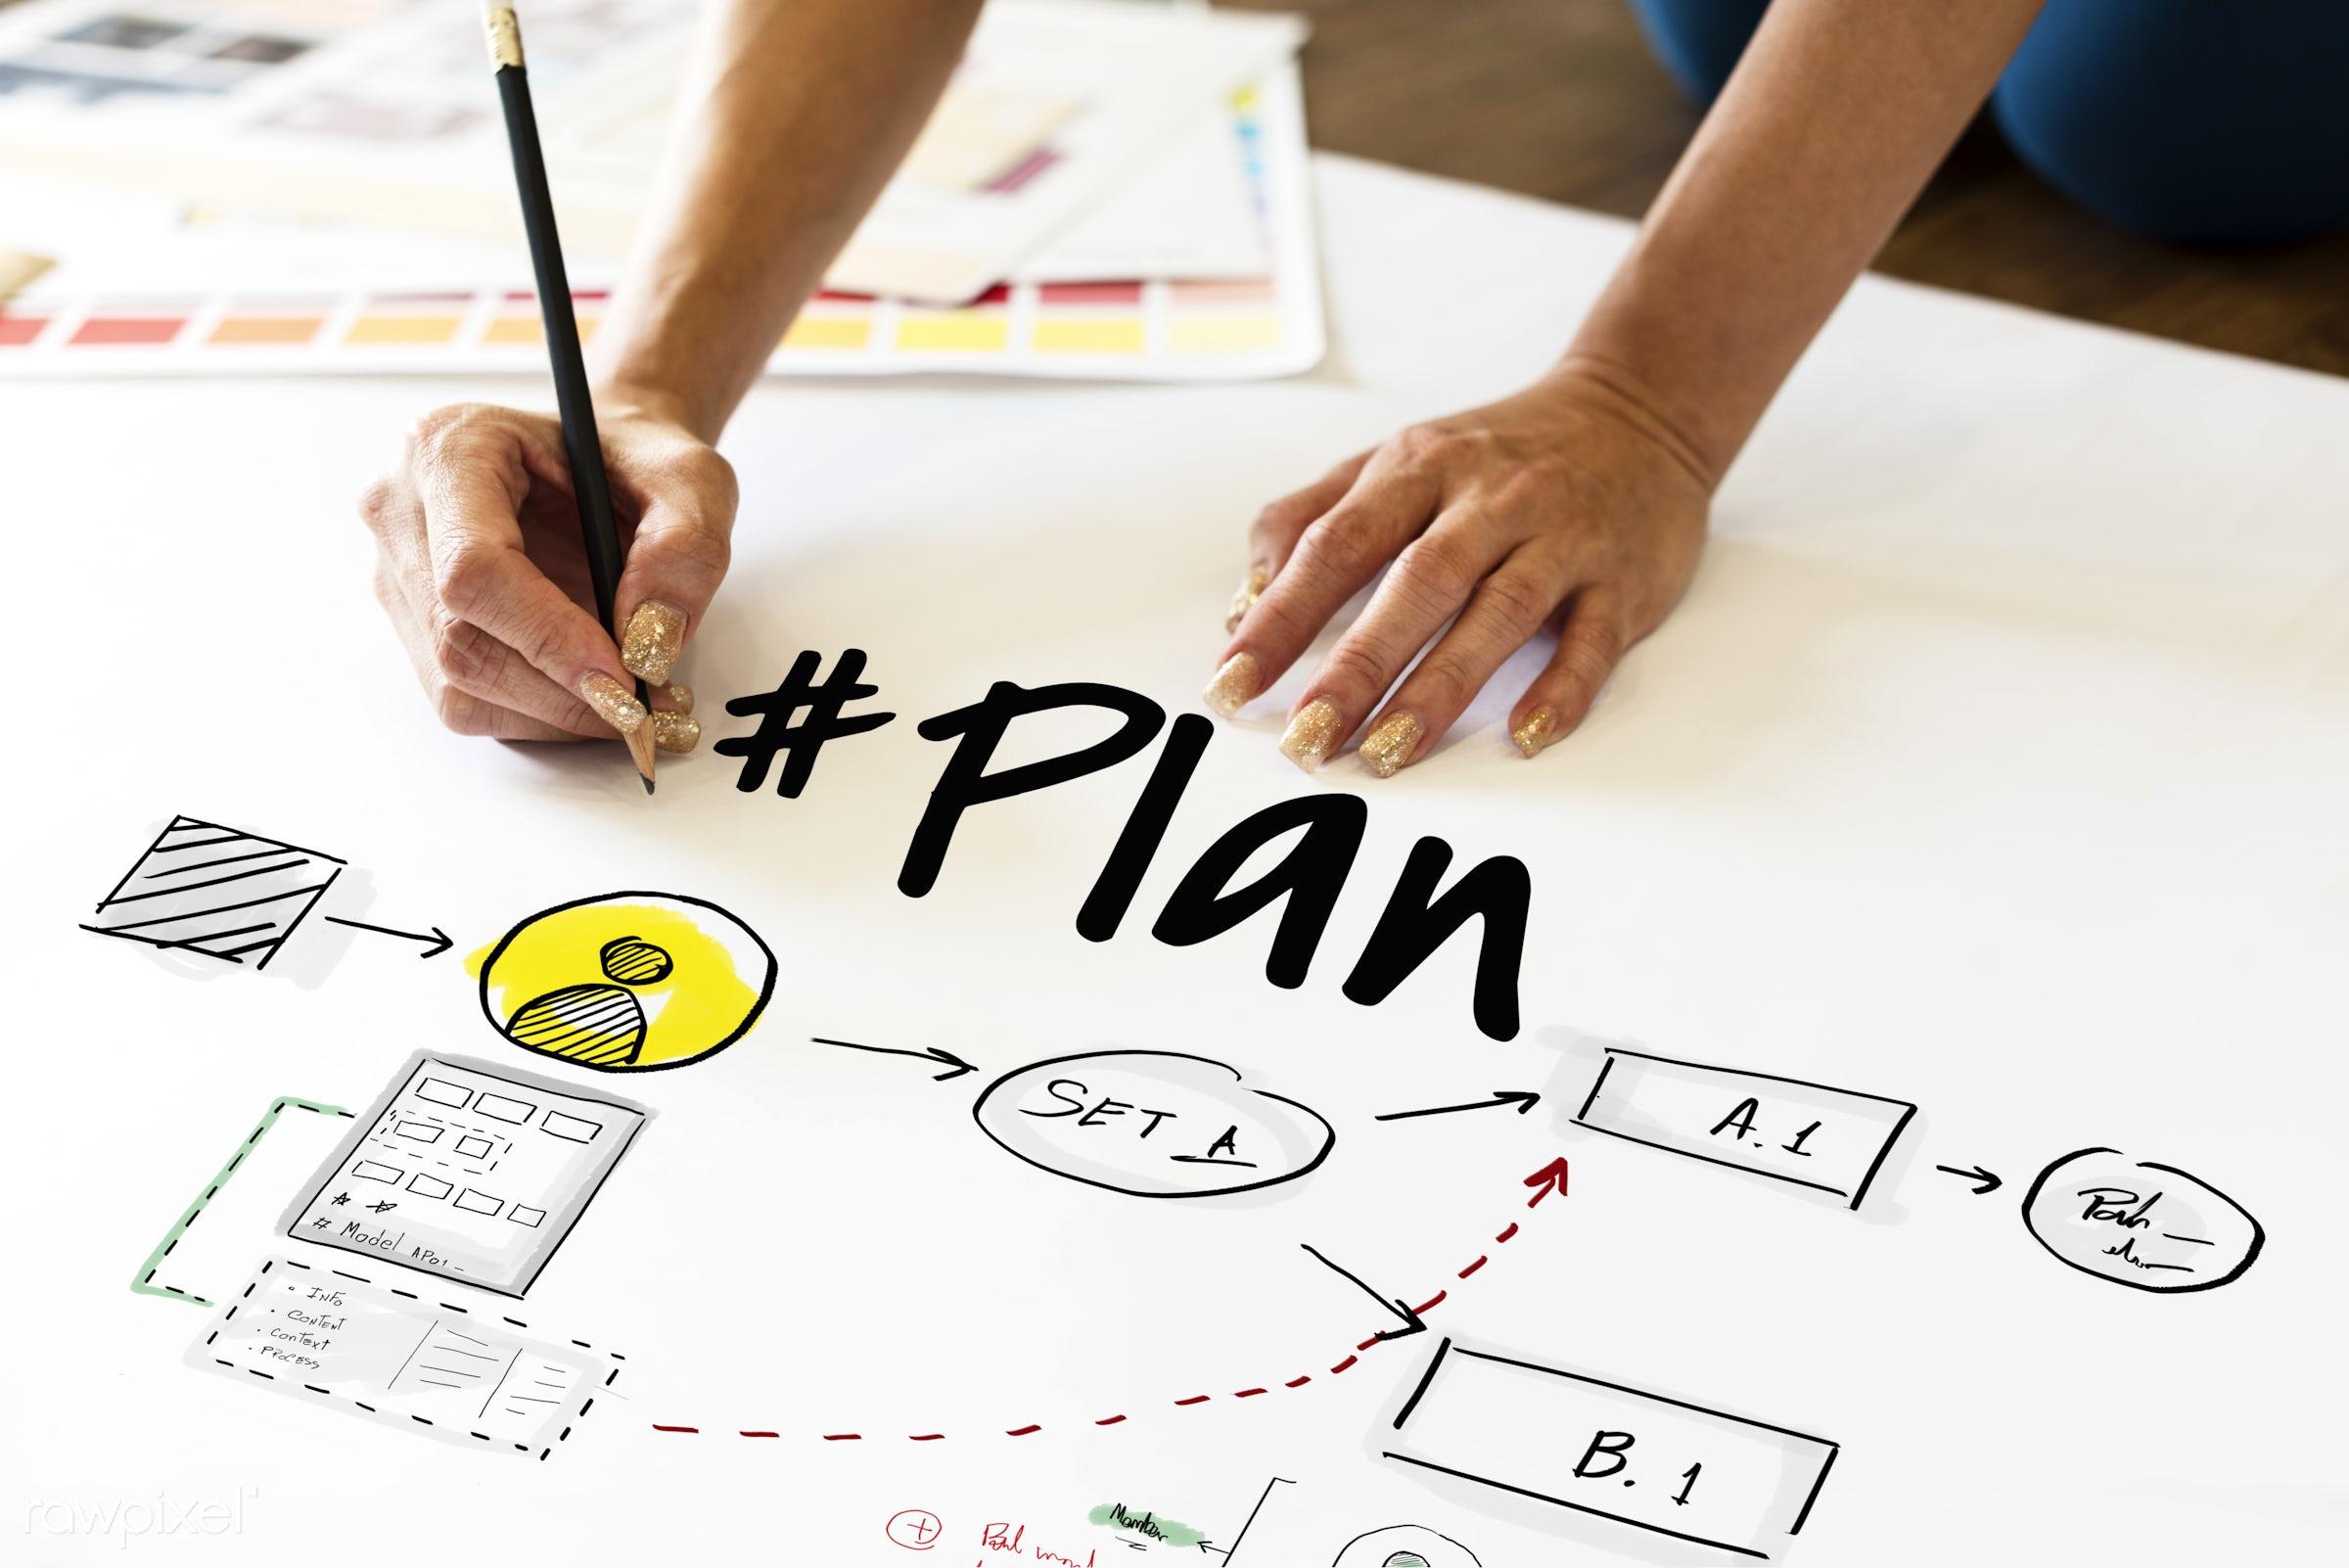 analysis, art, brainstorming, communication, connection, creation, creative, creativity, design, diagram, drawing, goal,...